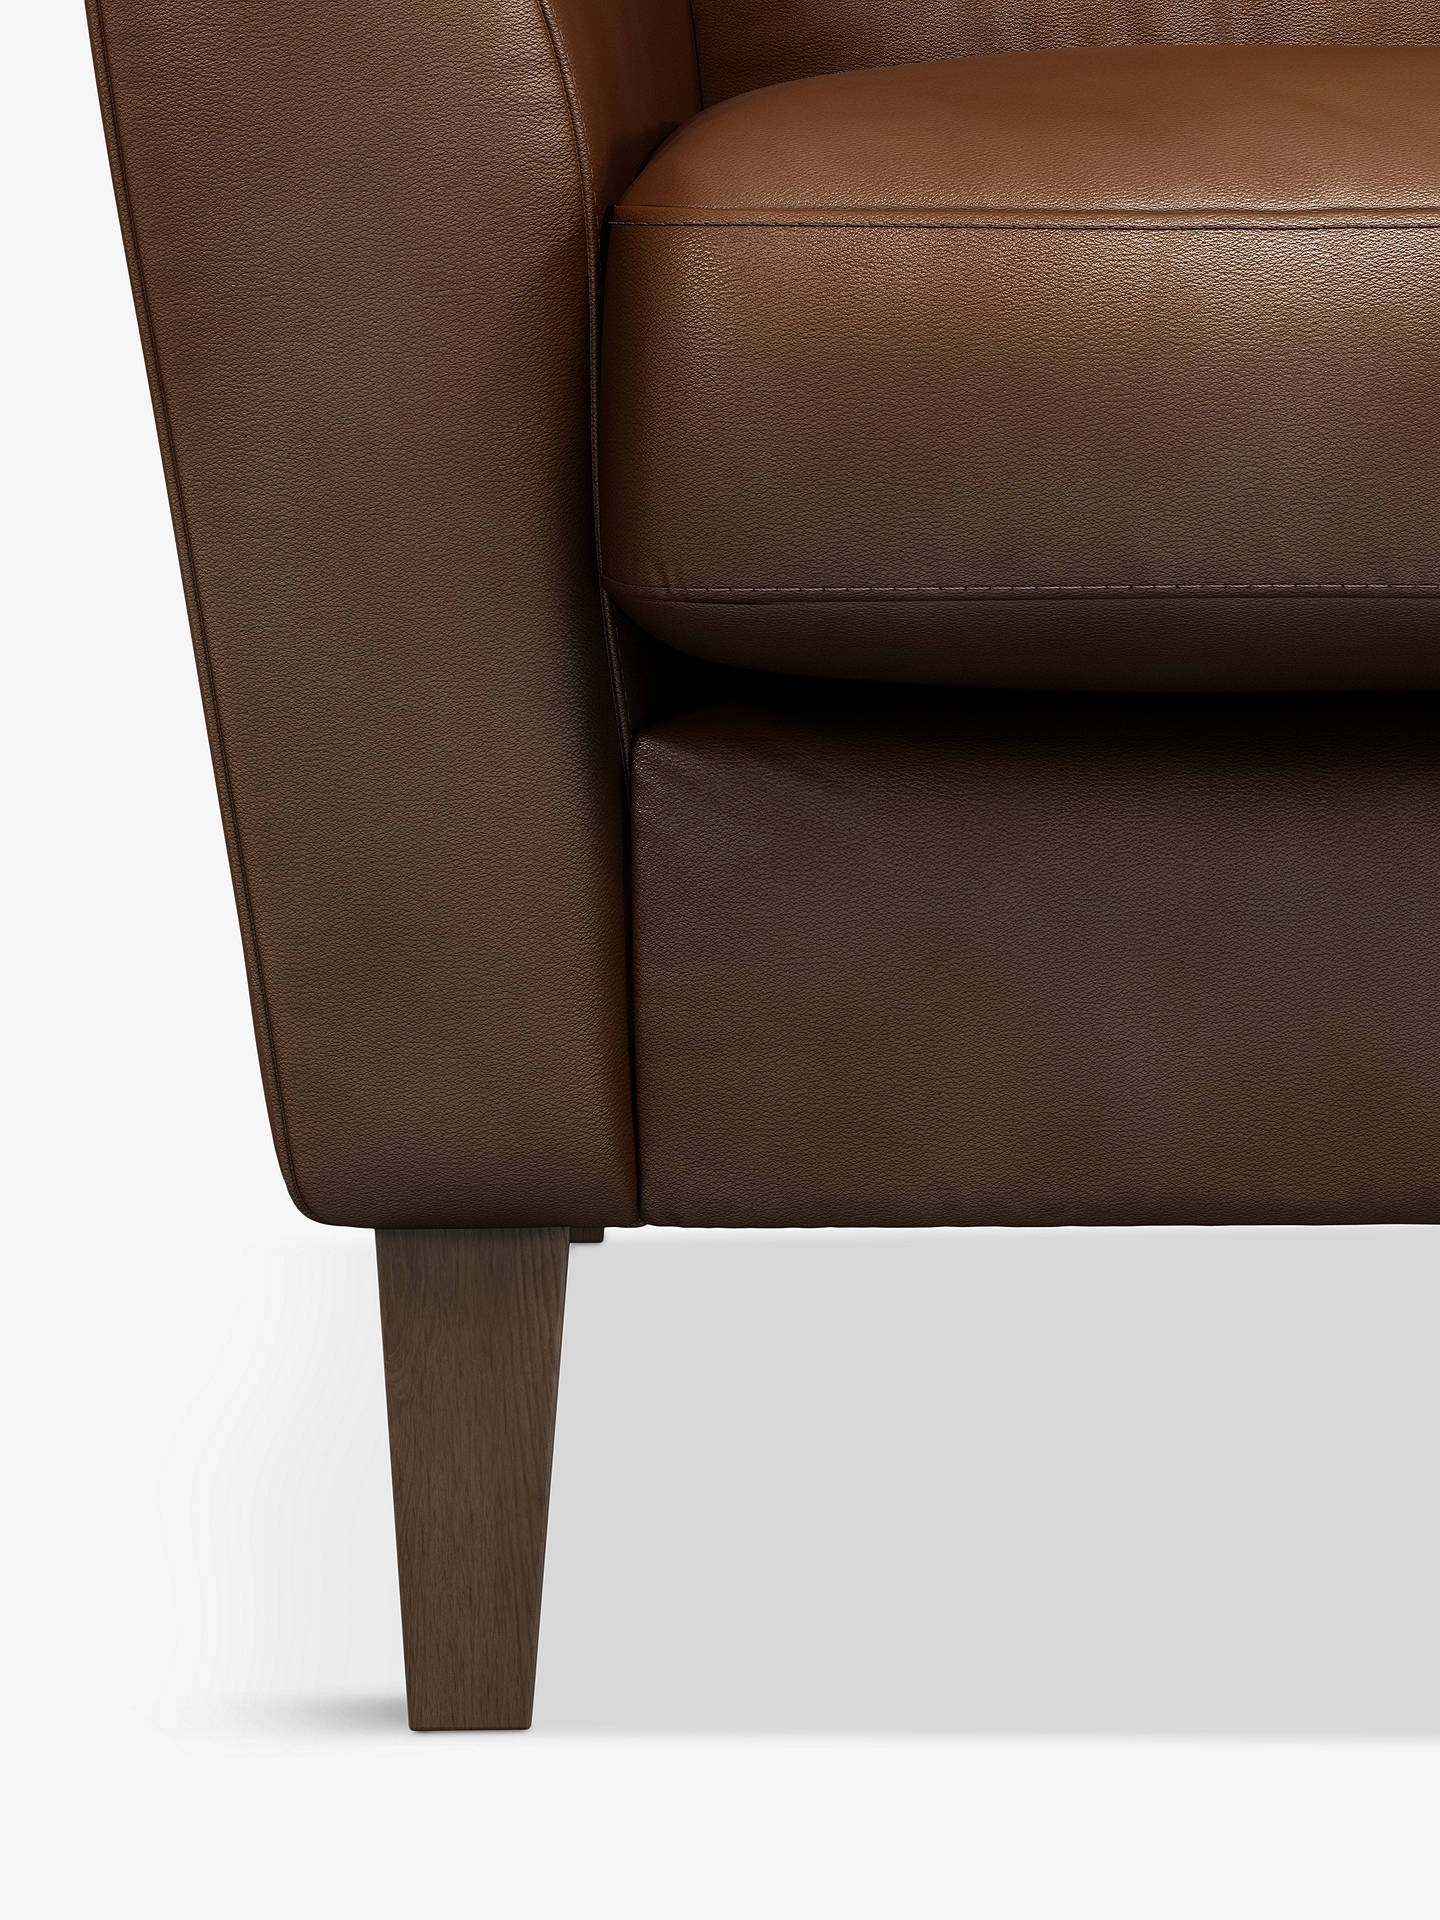 Swell John Lewis Partners Connor Leather Armchair Dark Leg Contempo Castanga Inzonedesignstudio Interior Chair Design Inzonedesignstudiocom